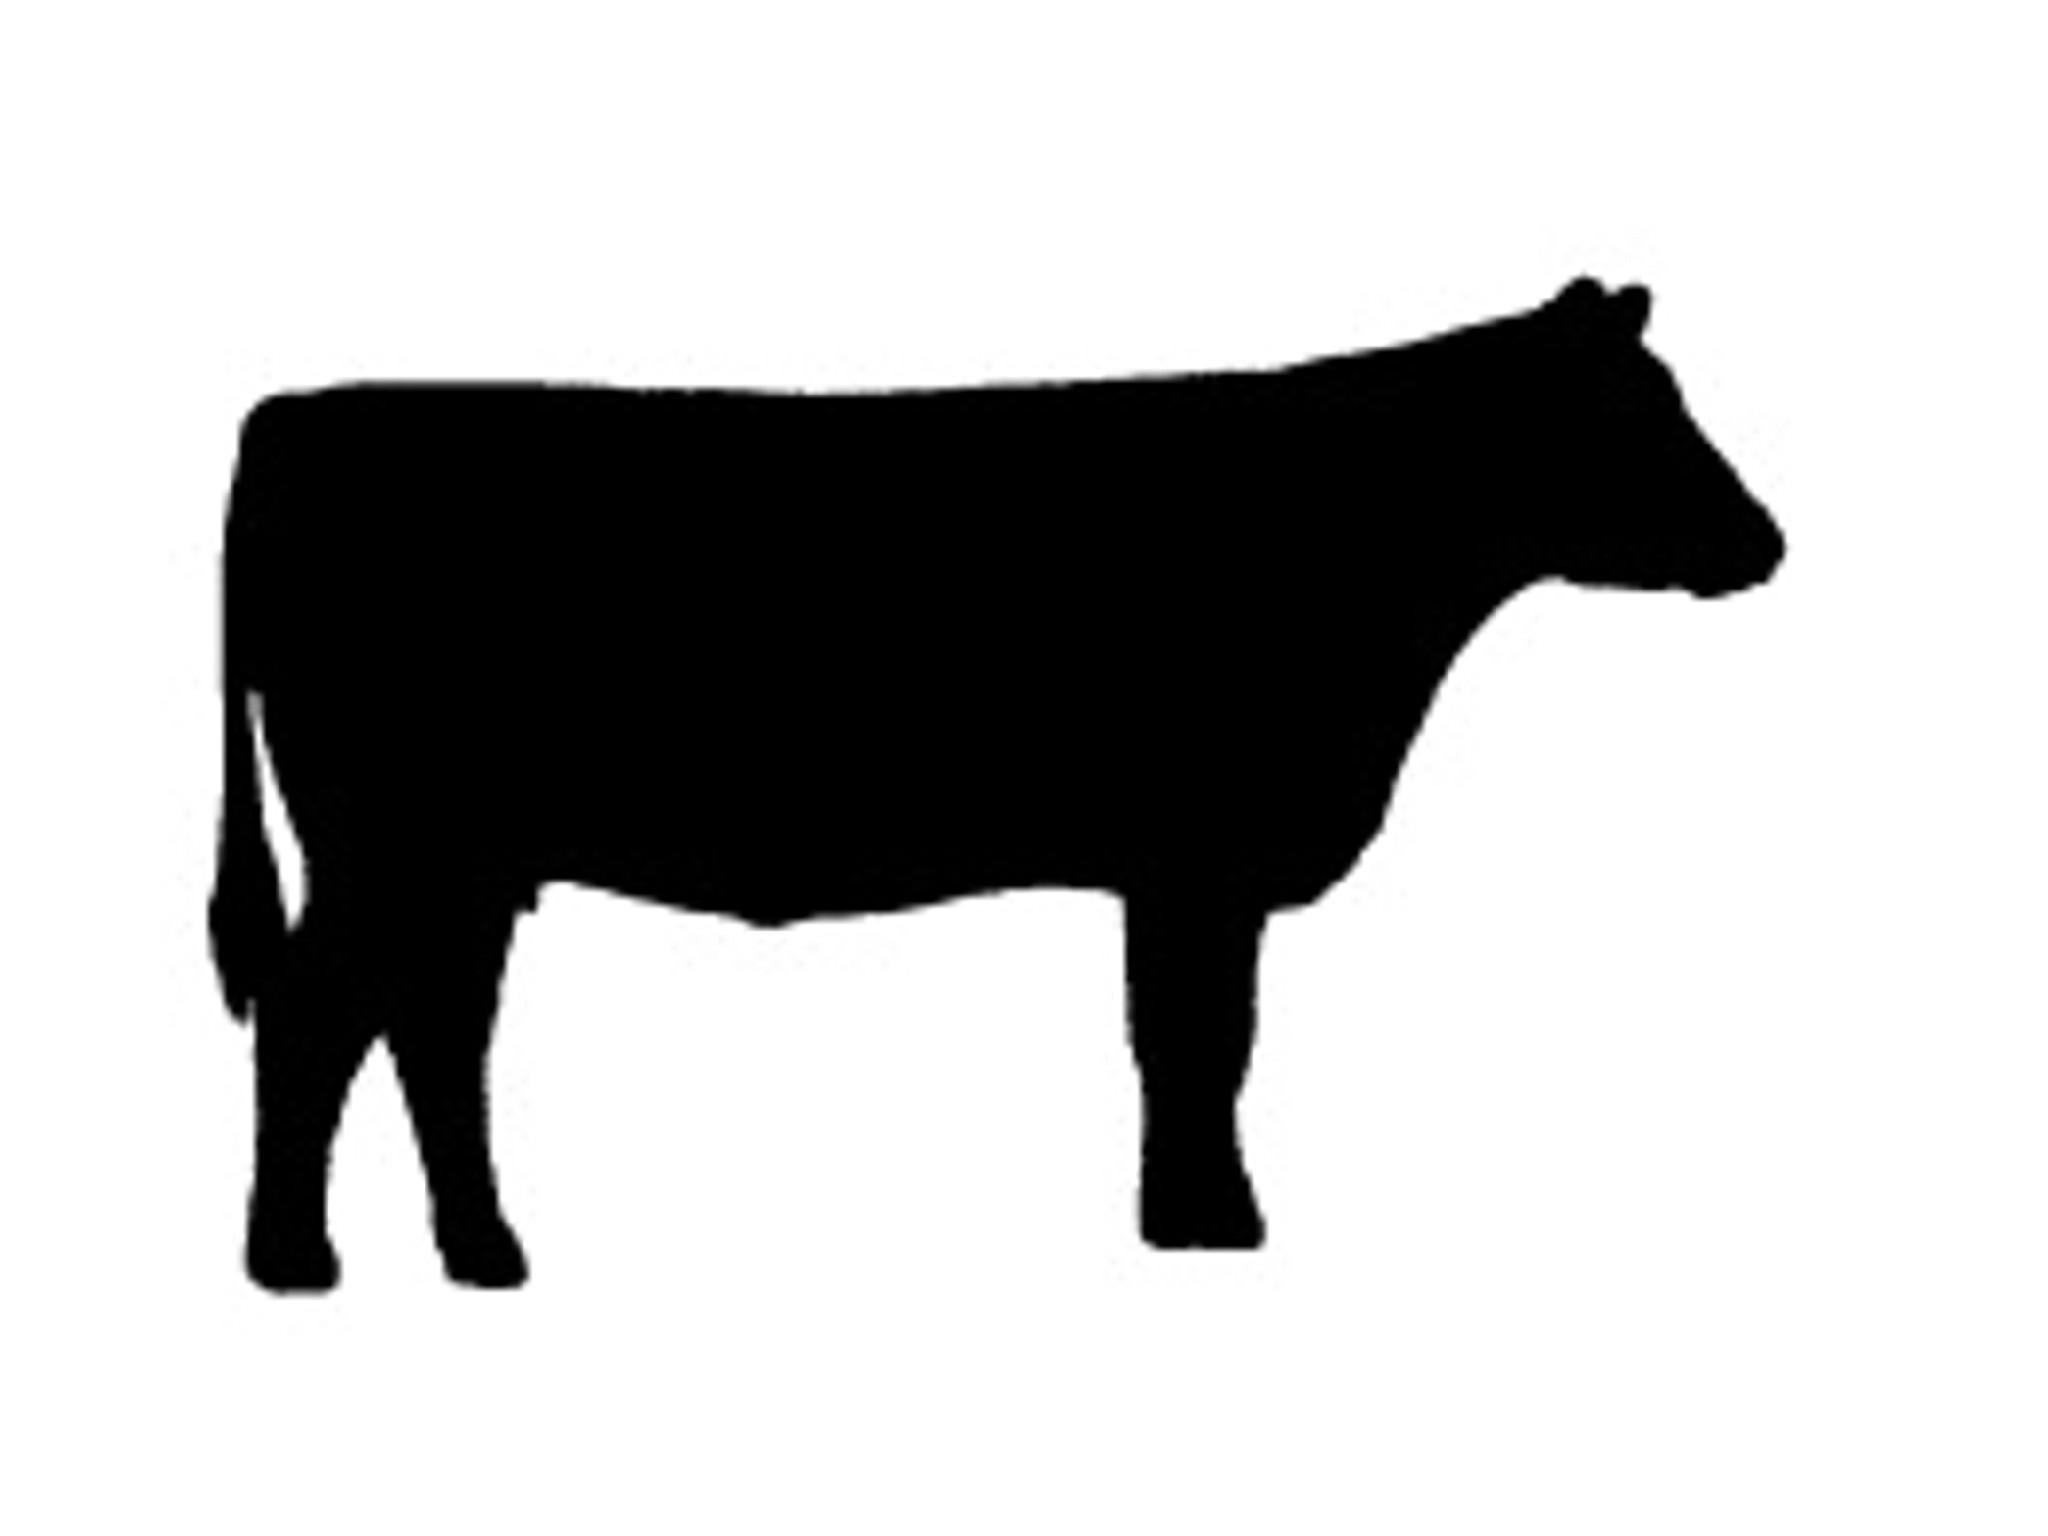 Heifer Cow Clipart.